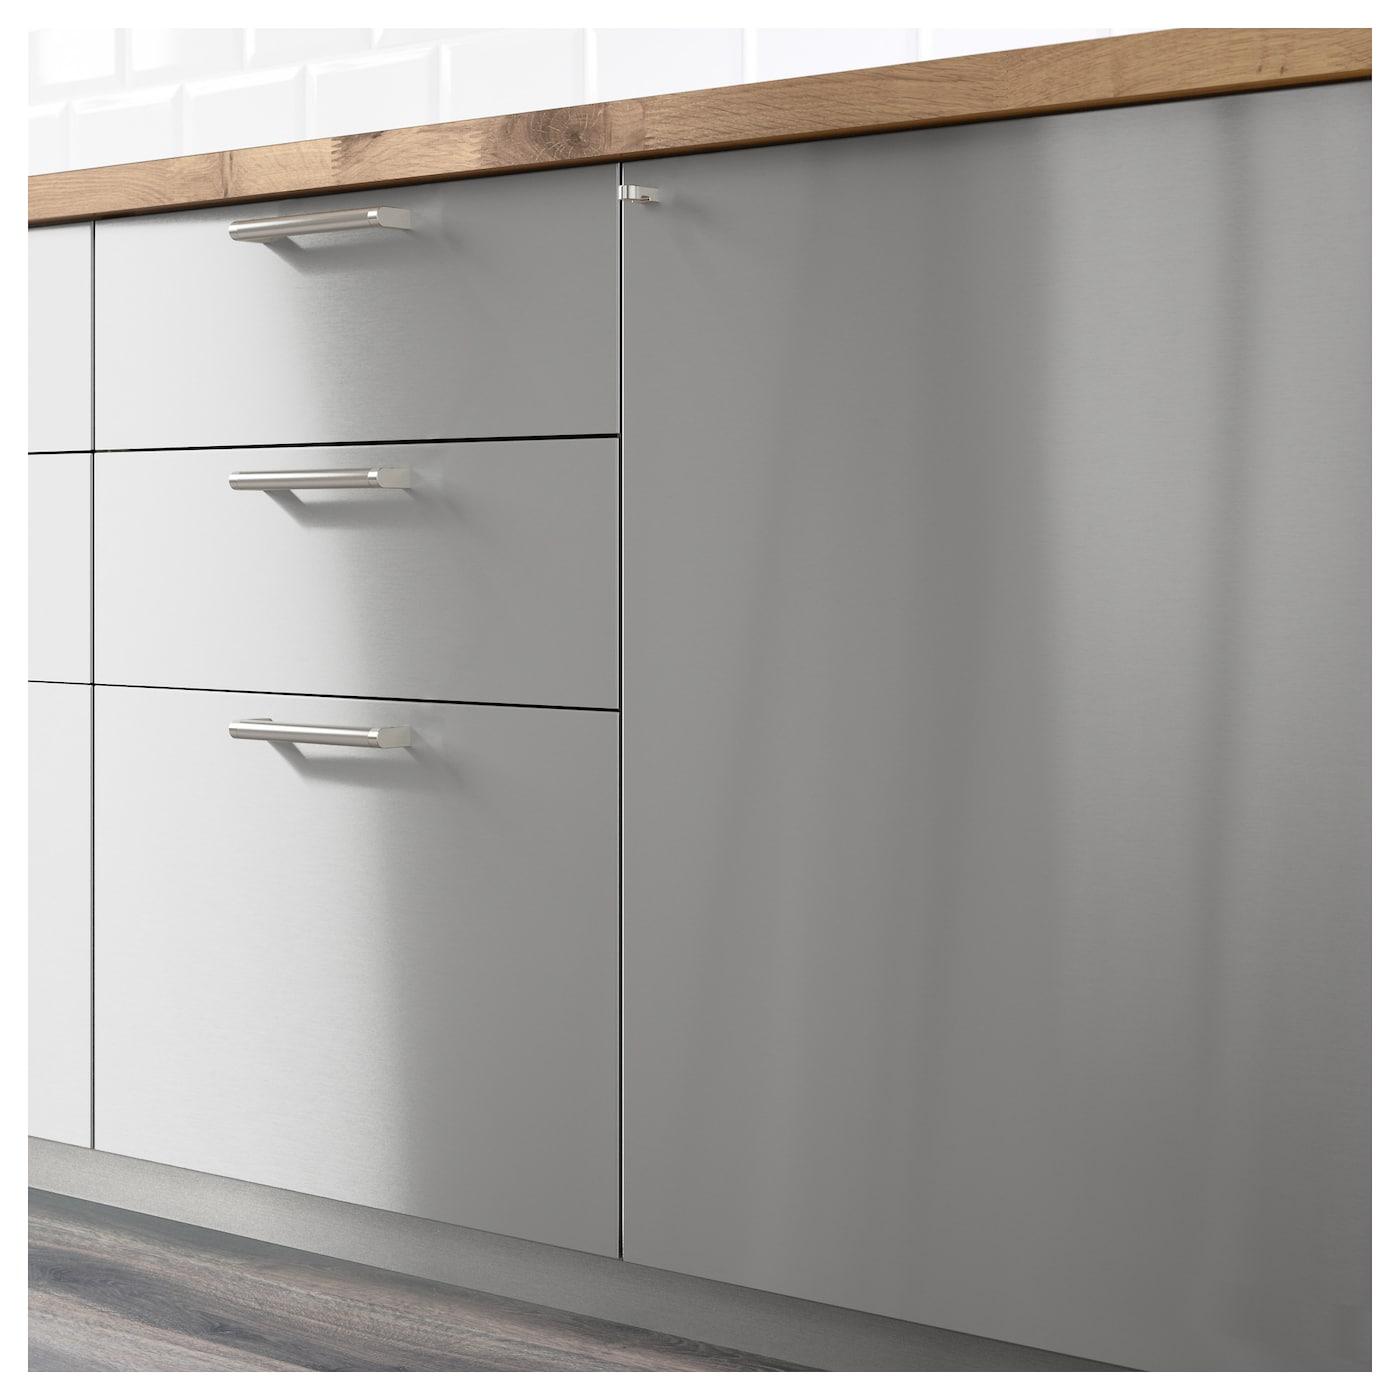 Stainless Steel Dishwasher Panel Kit Grevsta Front For Dishwasher Stainless Steel 45x80 Cm Ikea